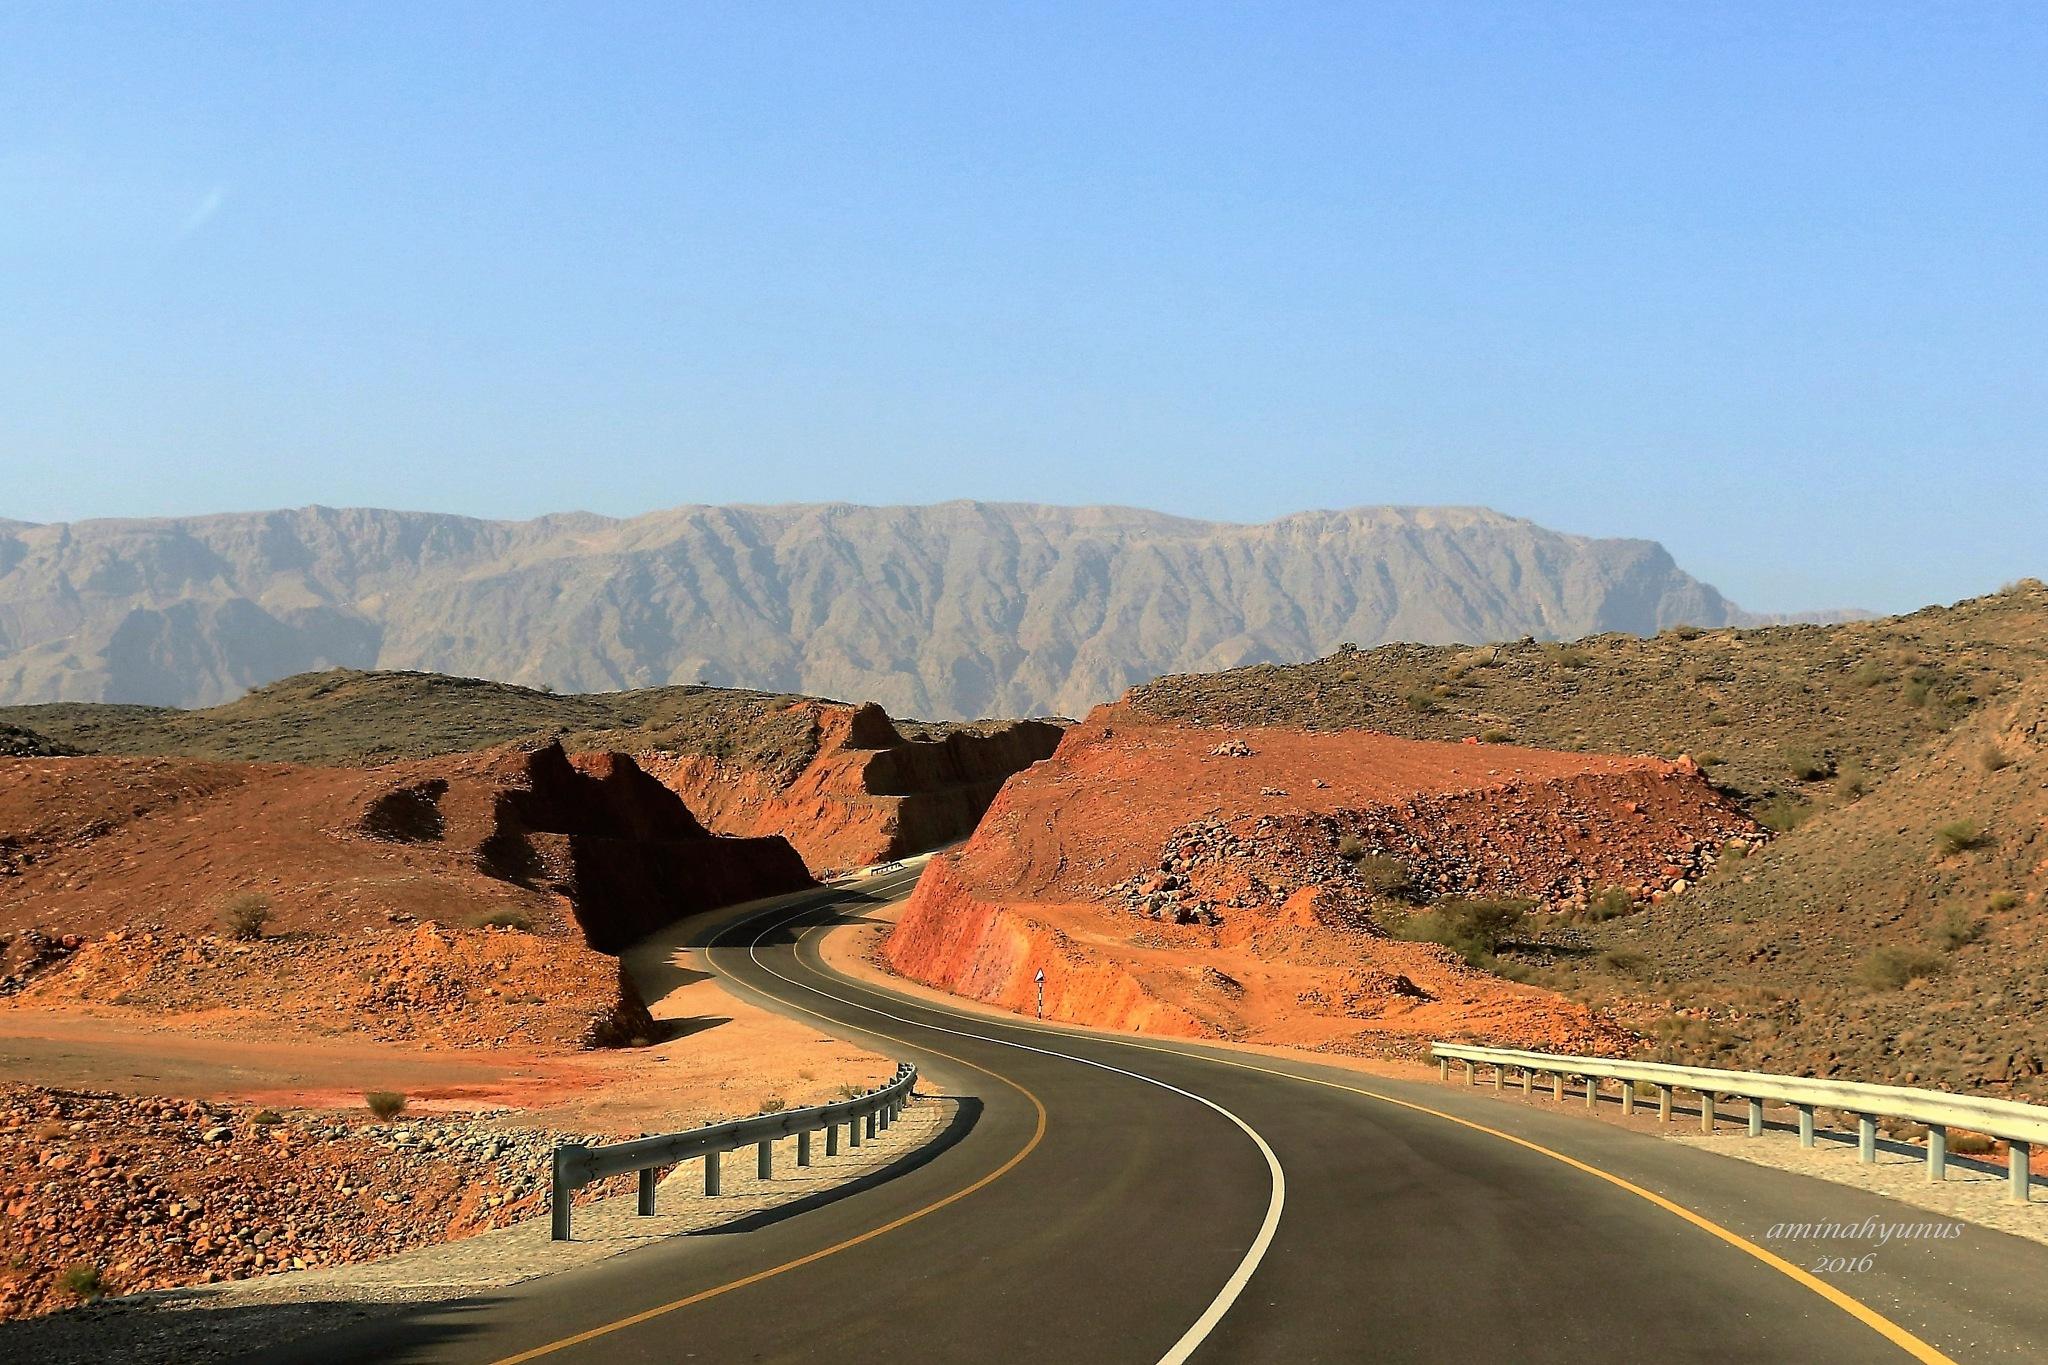 road into the mountain by Aminah Yunus